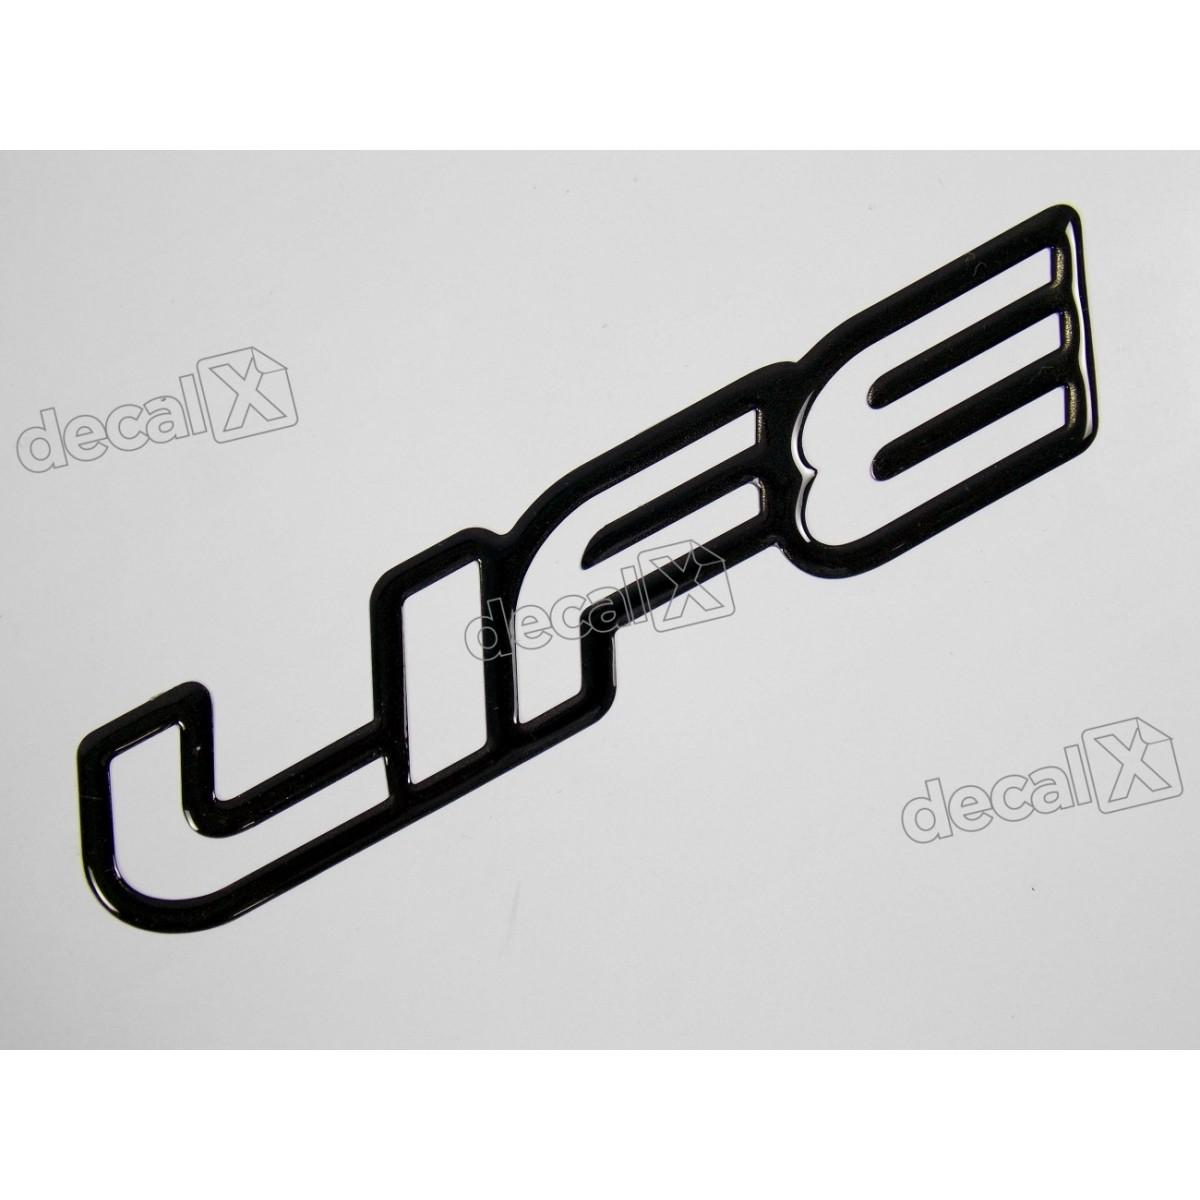 Adesivo Emblema Life Celta Classic Corsa Resinado Preto